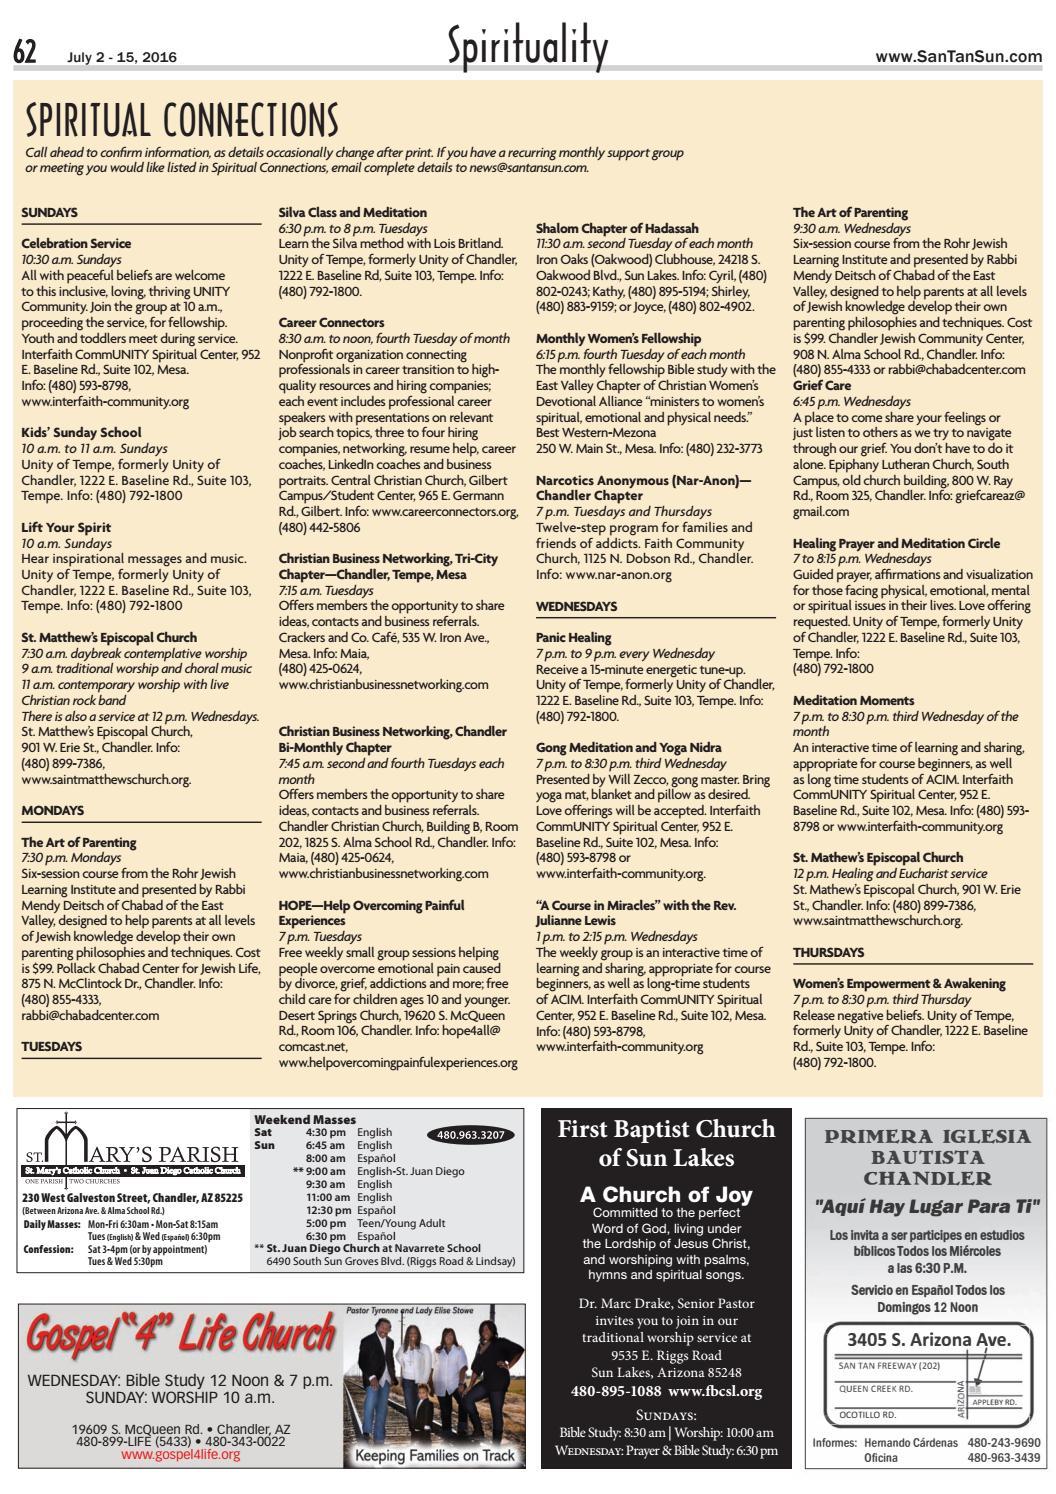 SanTan Sun News - July 2, 2016 by Times Media Group - issuu